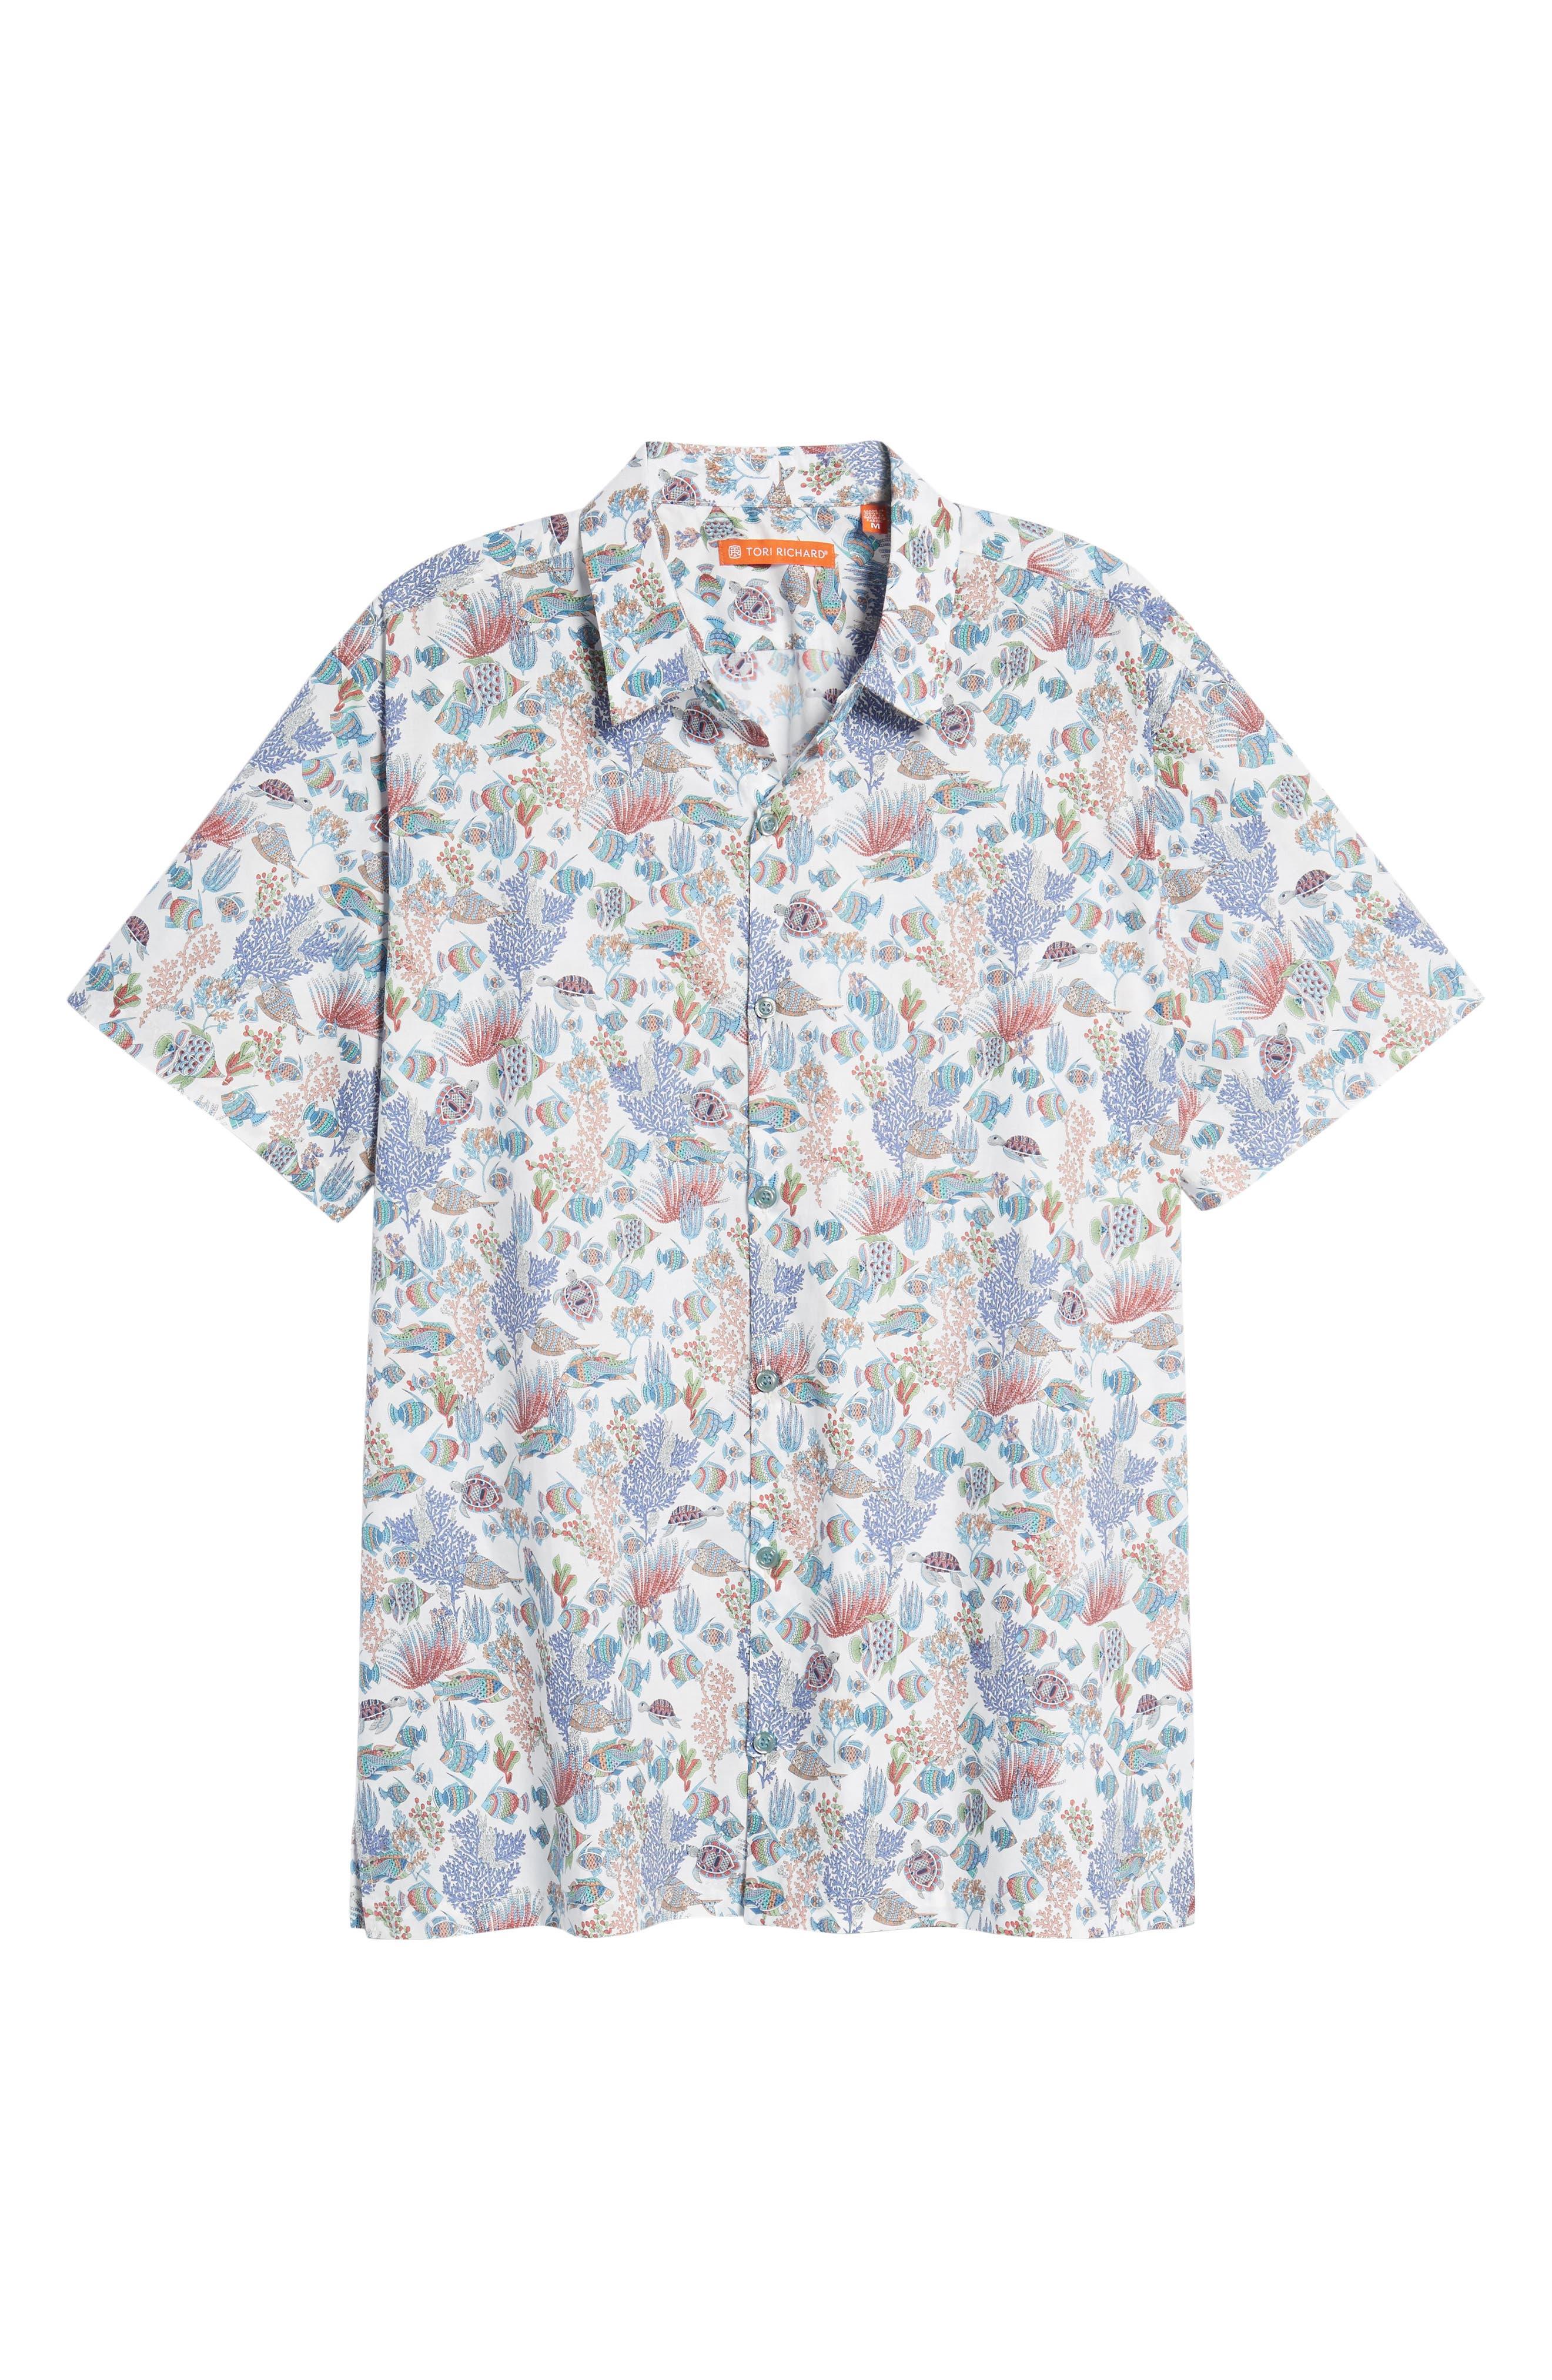 Aquaculture Slim Fit Camp Shirt,                             Alternate thumbnail 6, color,                             100